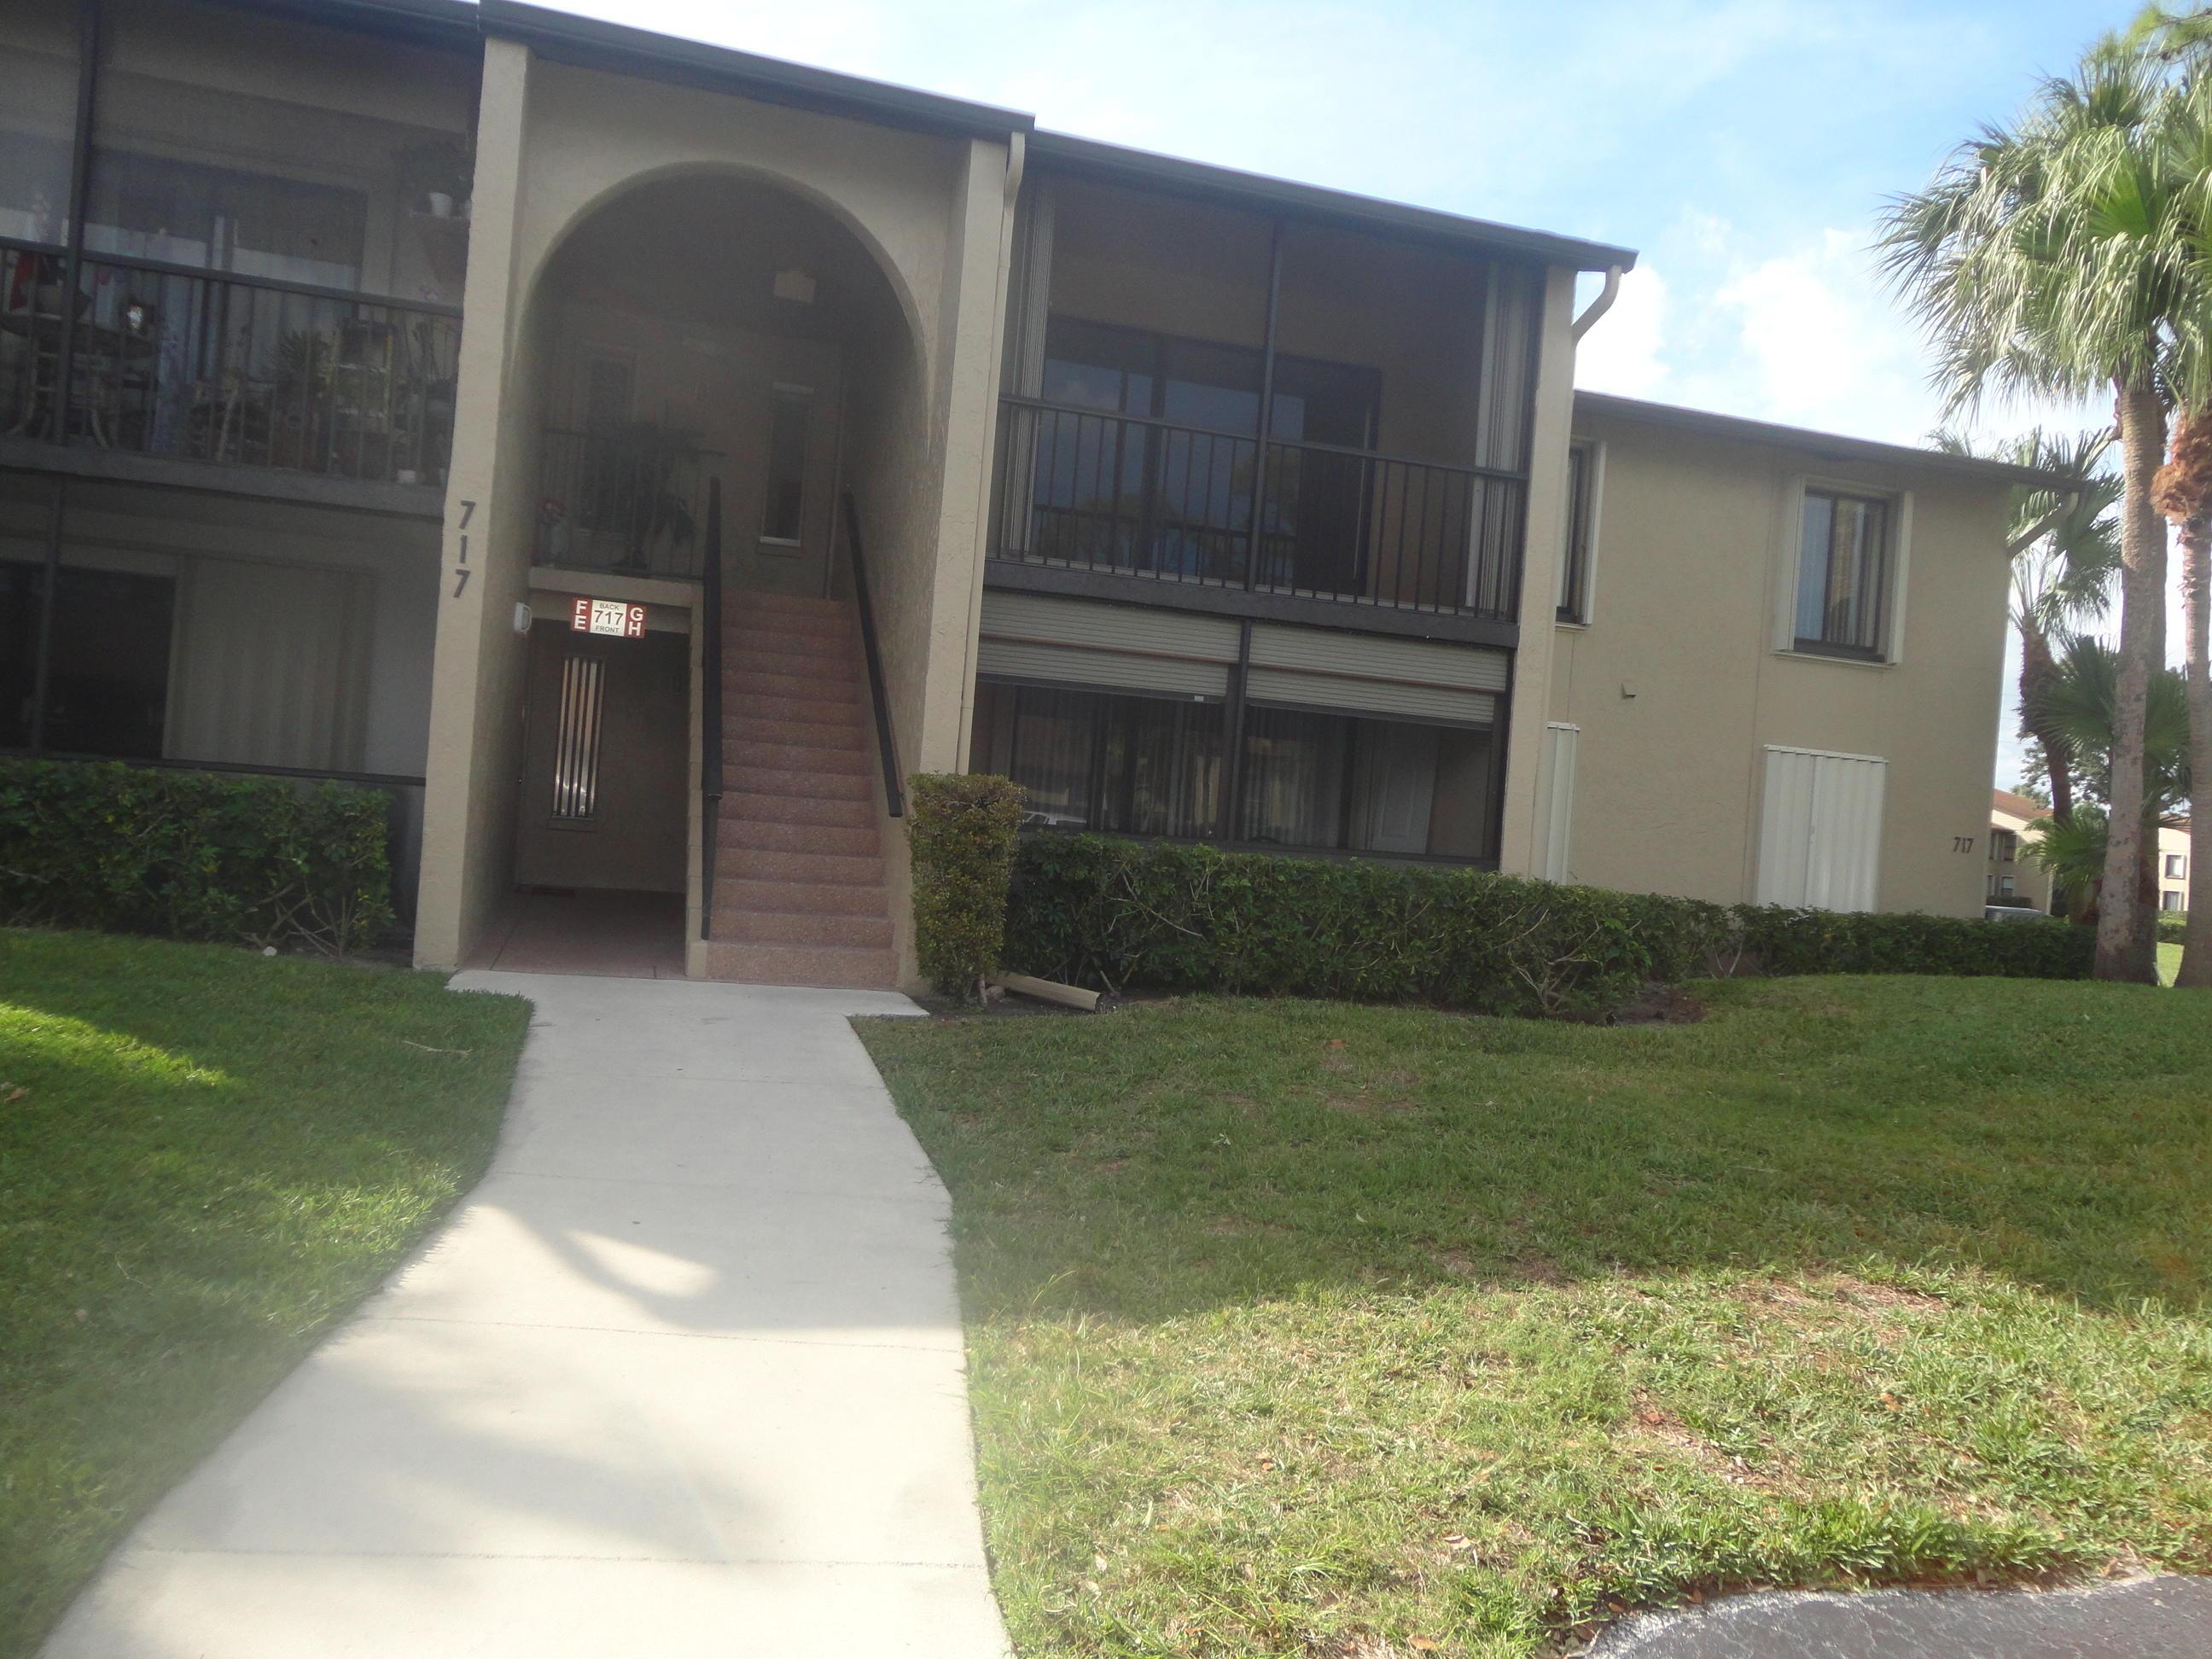 717 Sunny Pine Way, Greenacres, FL 33415